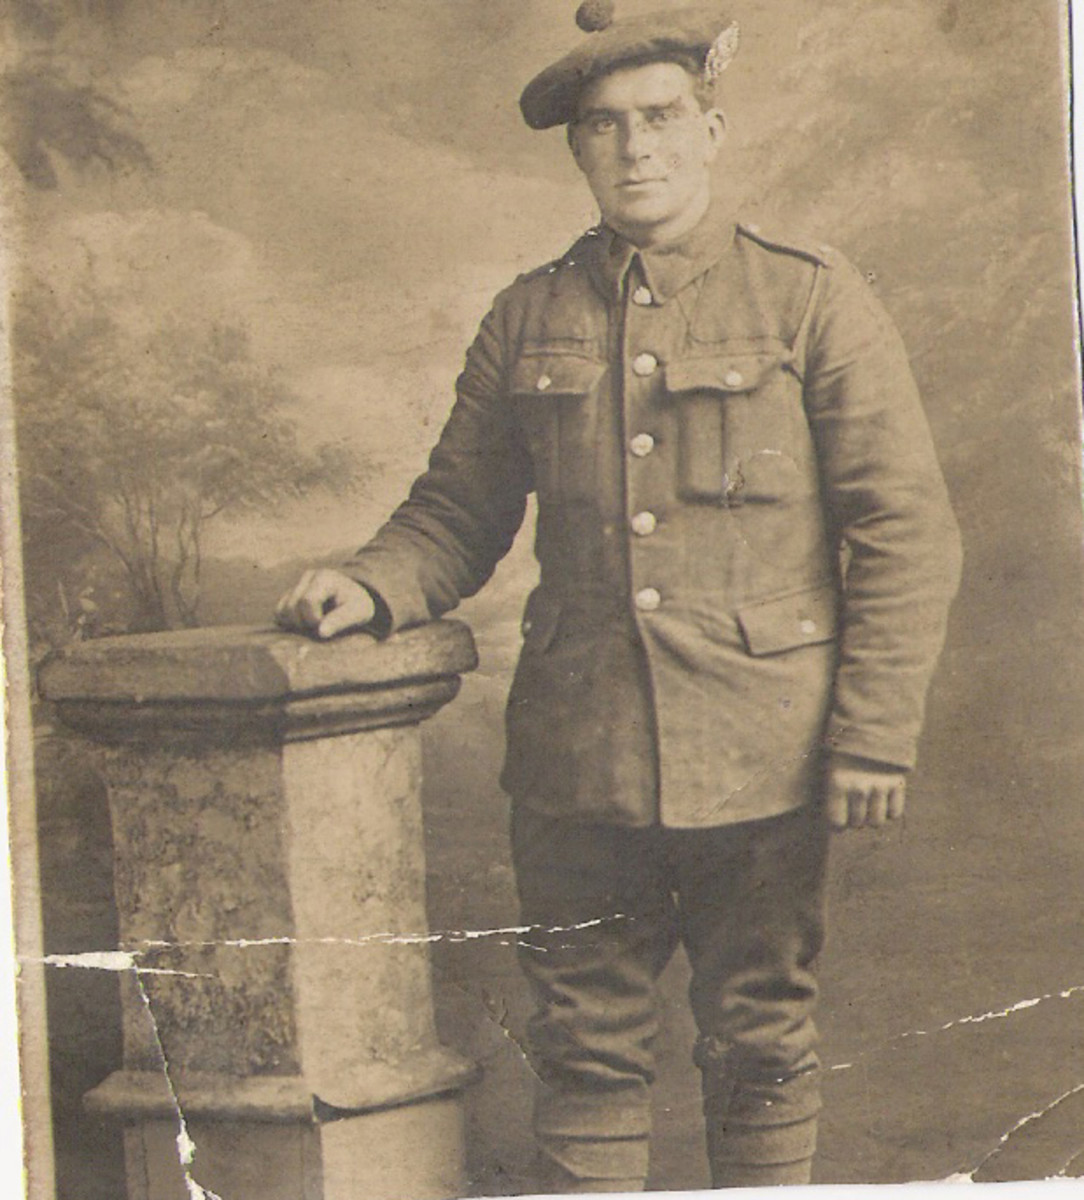 My great grandfather, Greenock, Scotland